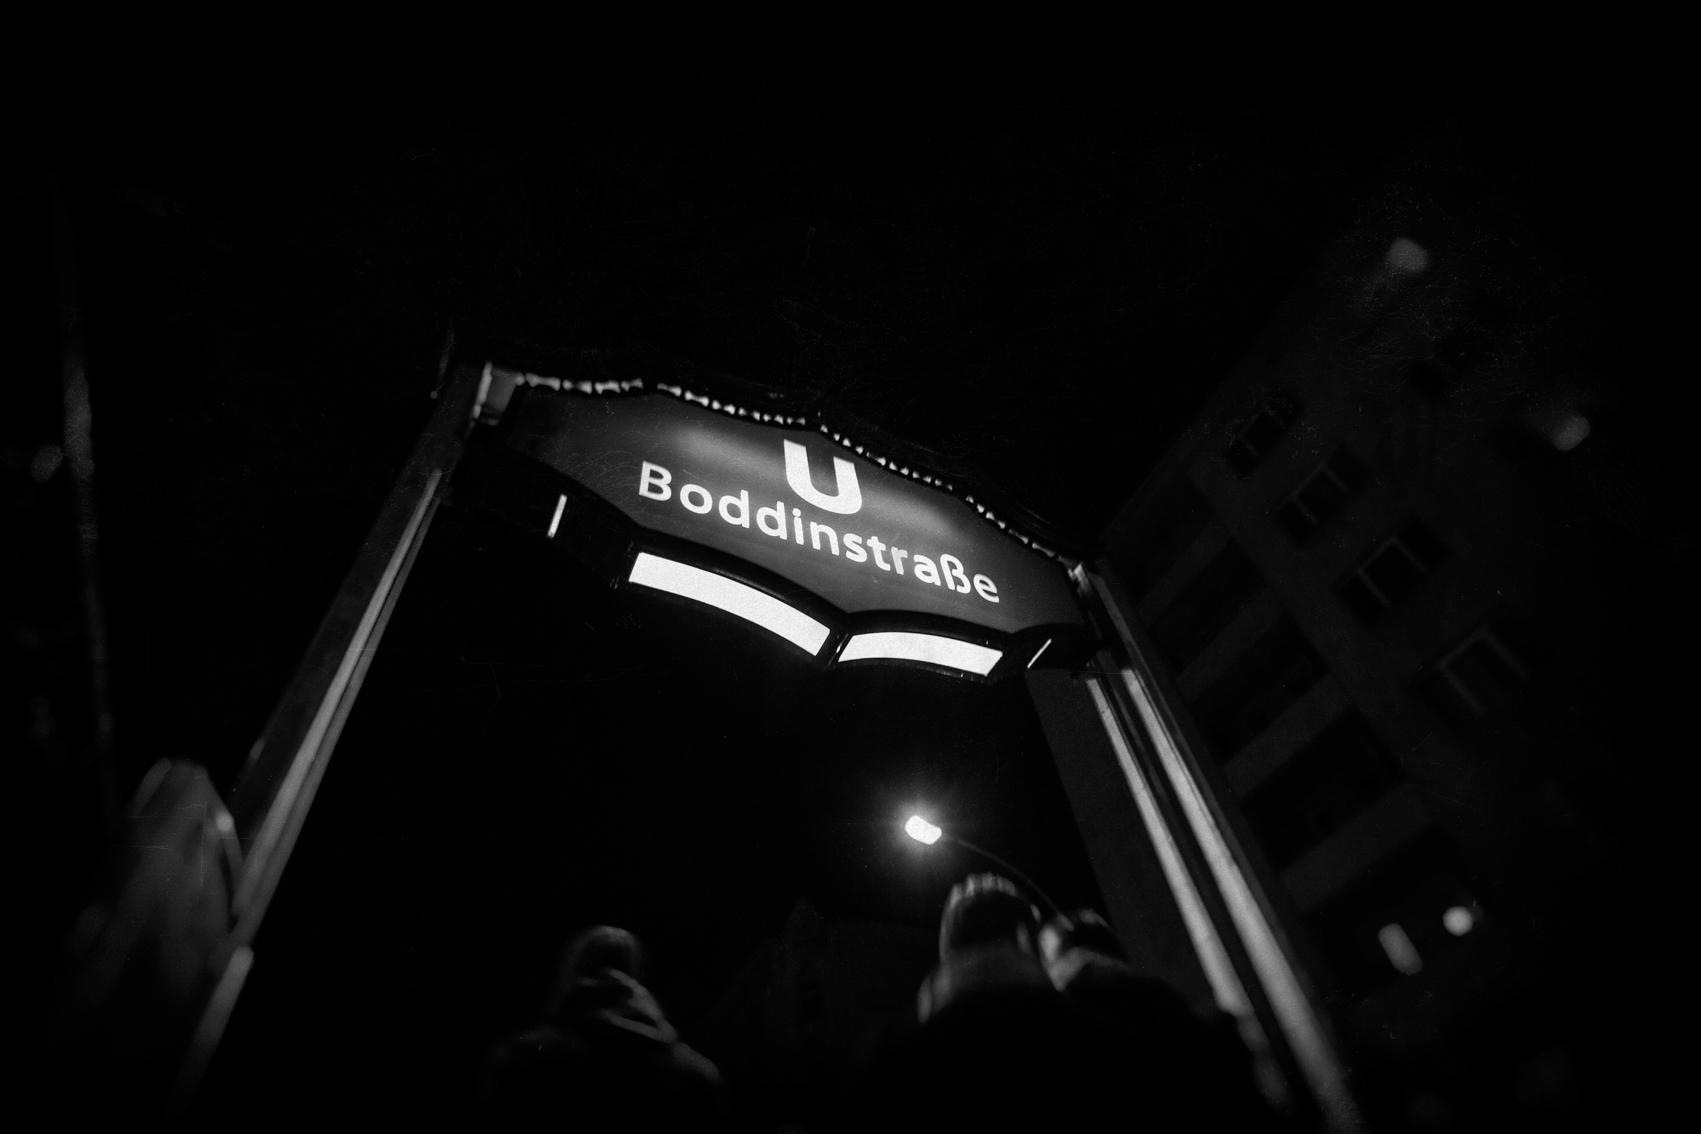 Boddinestrasse_-_Mercier_Baptiste_©